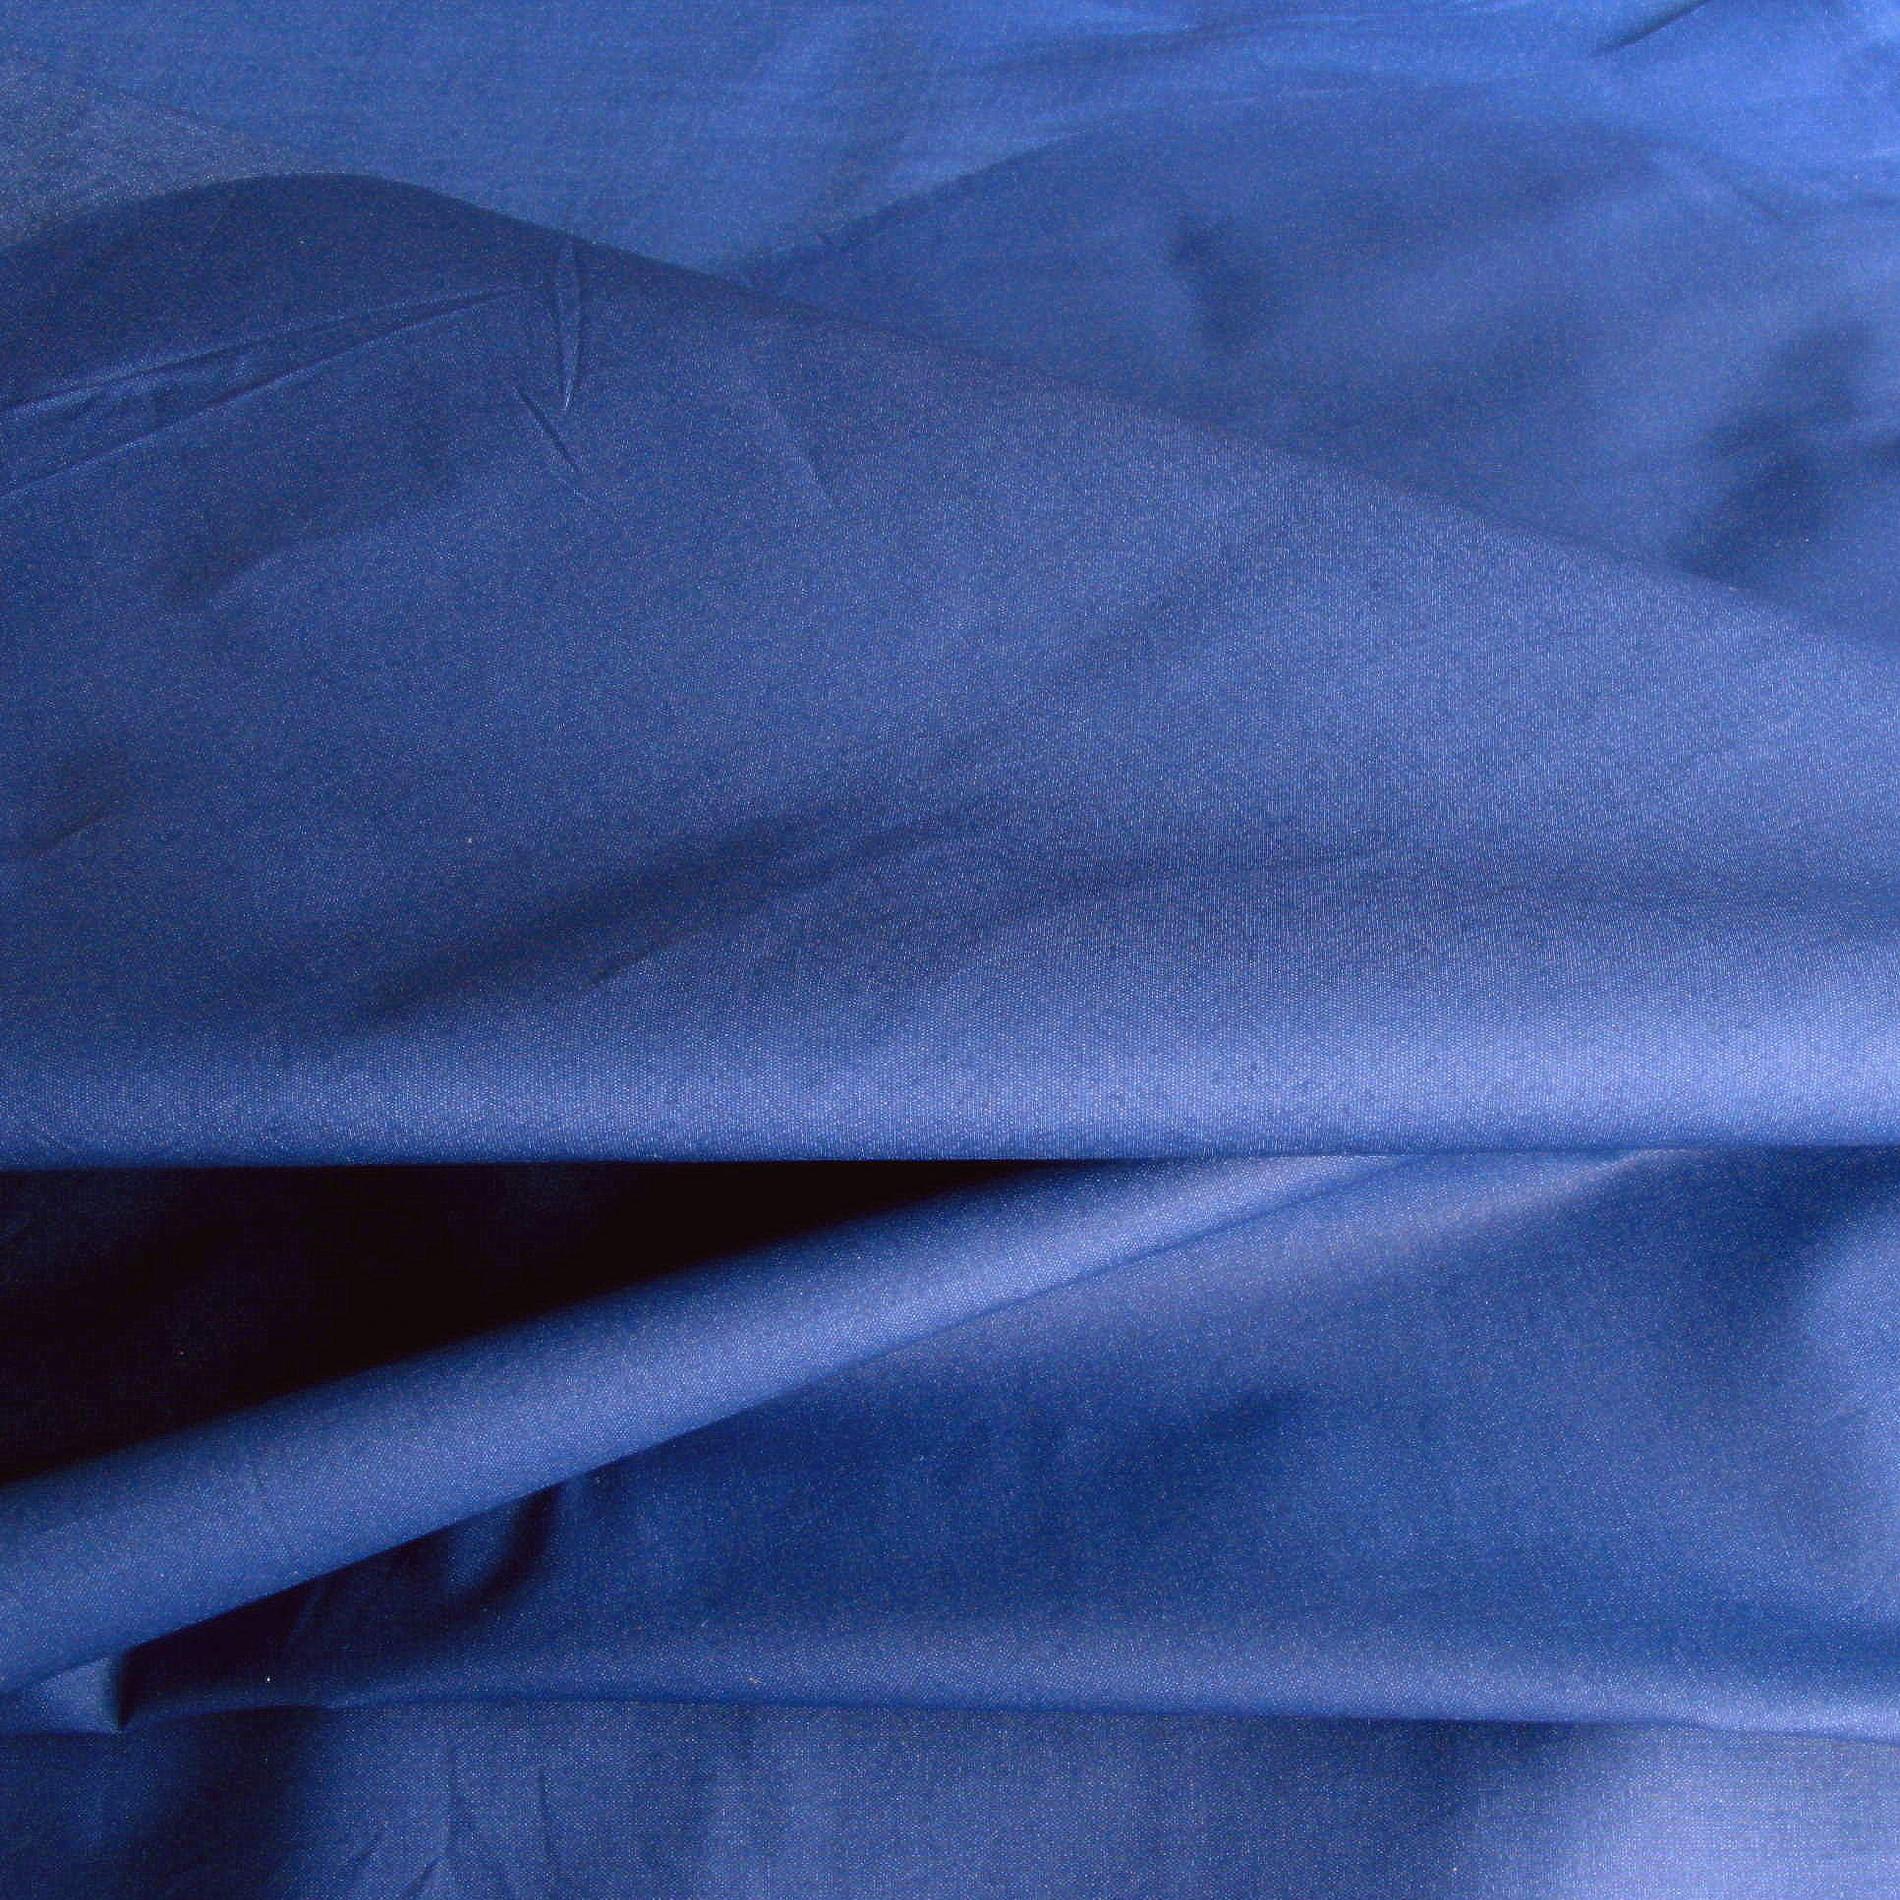 stretch baumwoll chintz poplin uni stoffe blaue stoffe. Black Bedroom Furniture Sets. Home Design Ideas